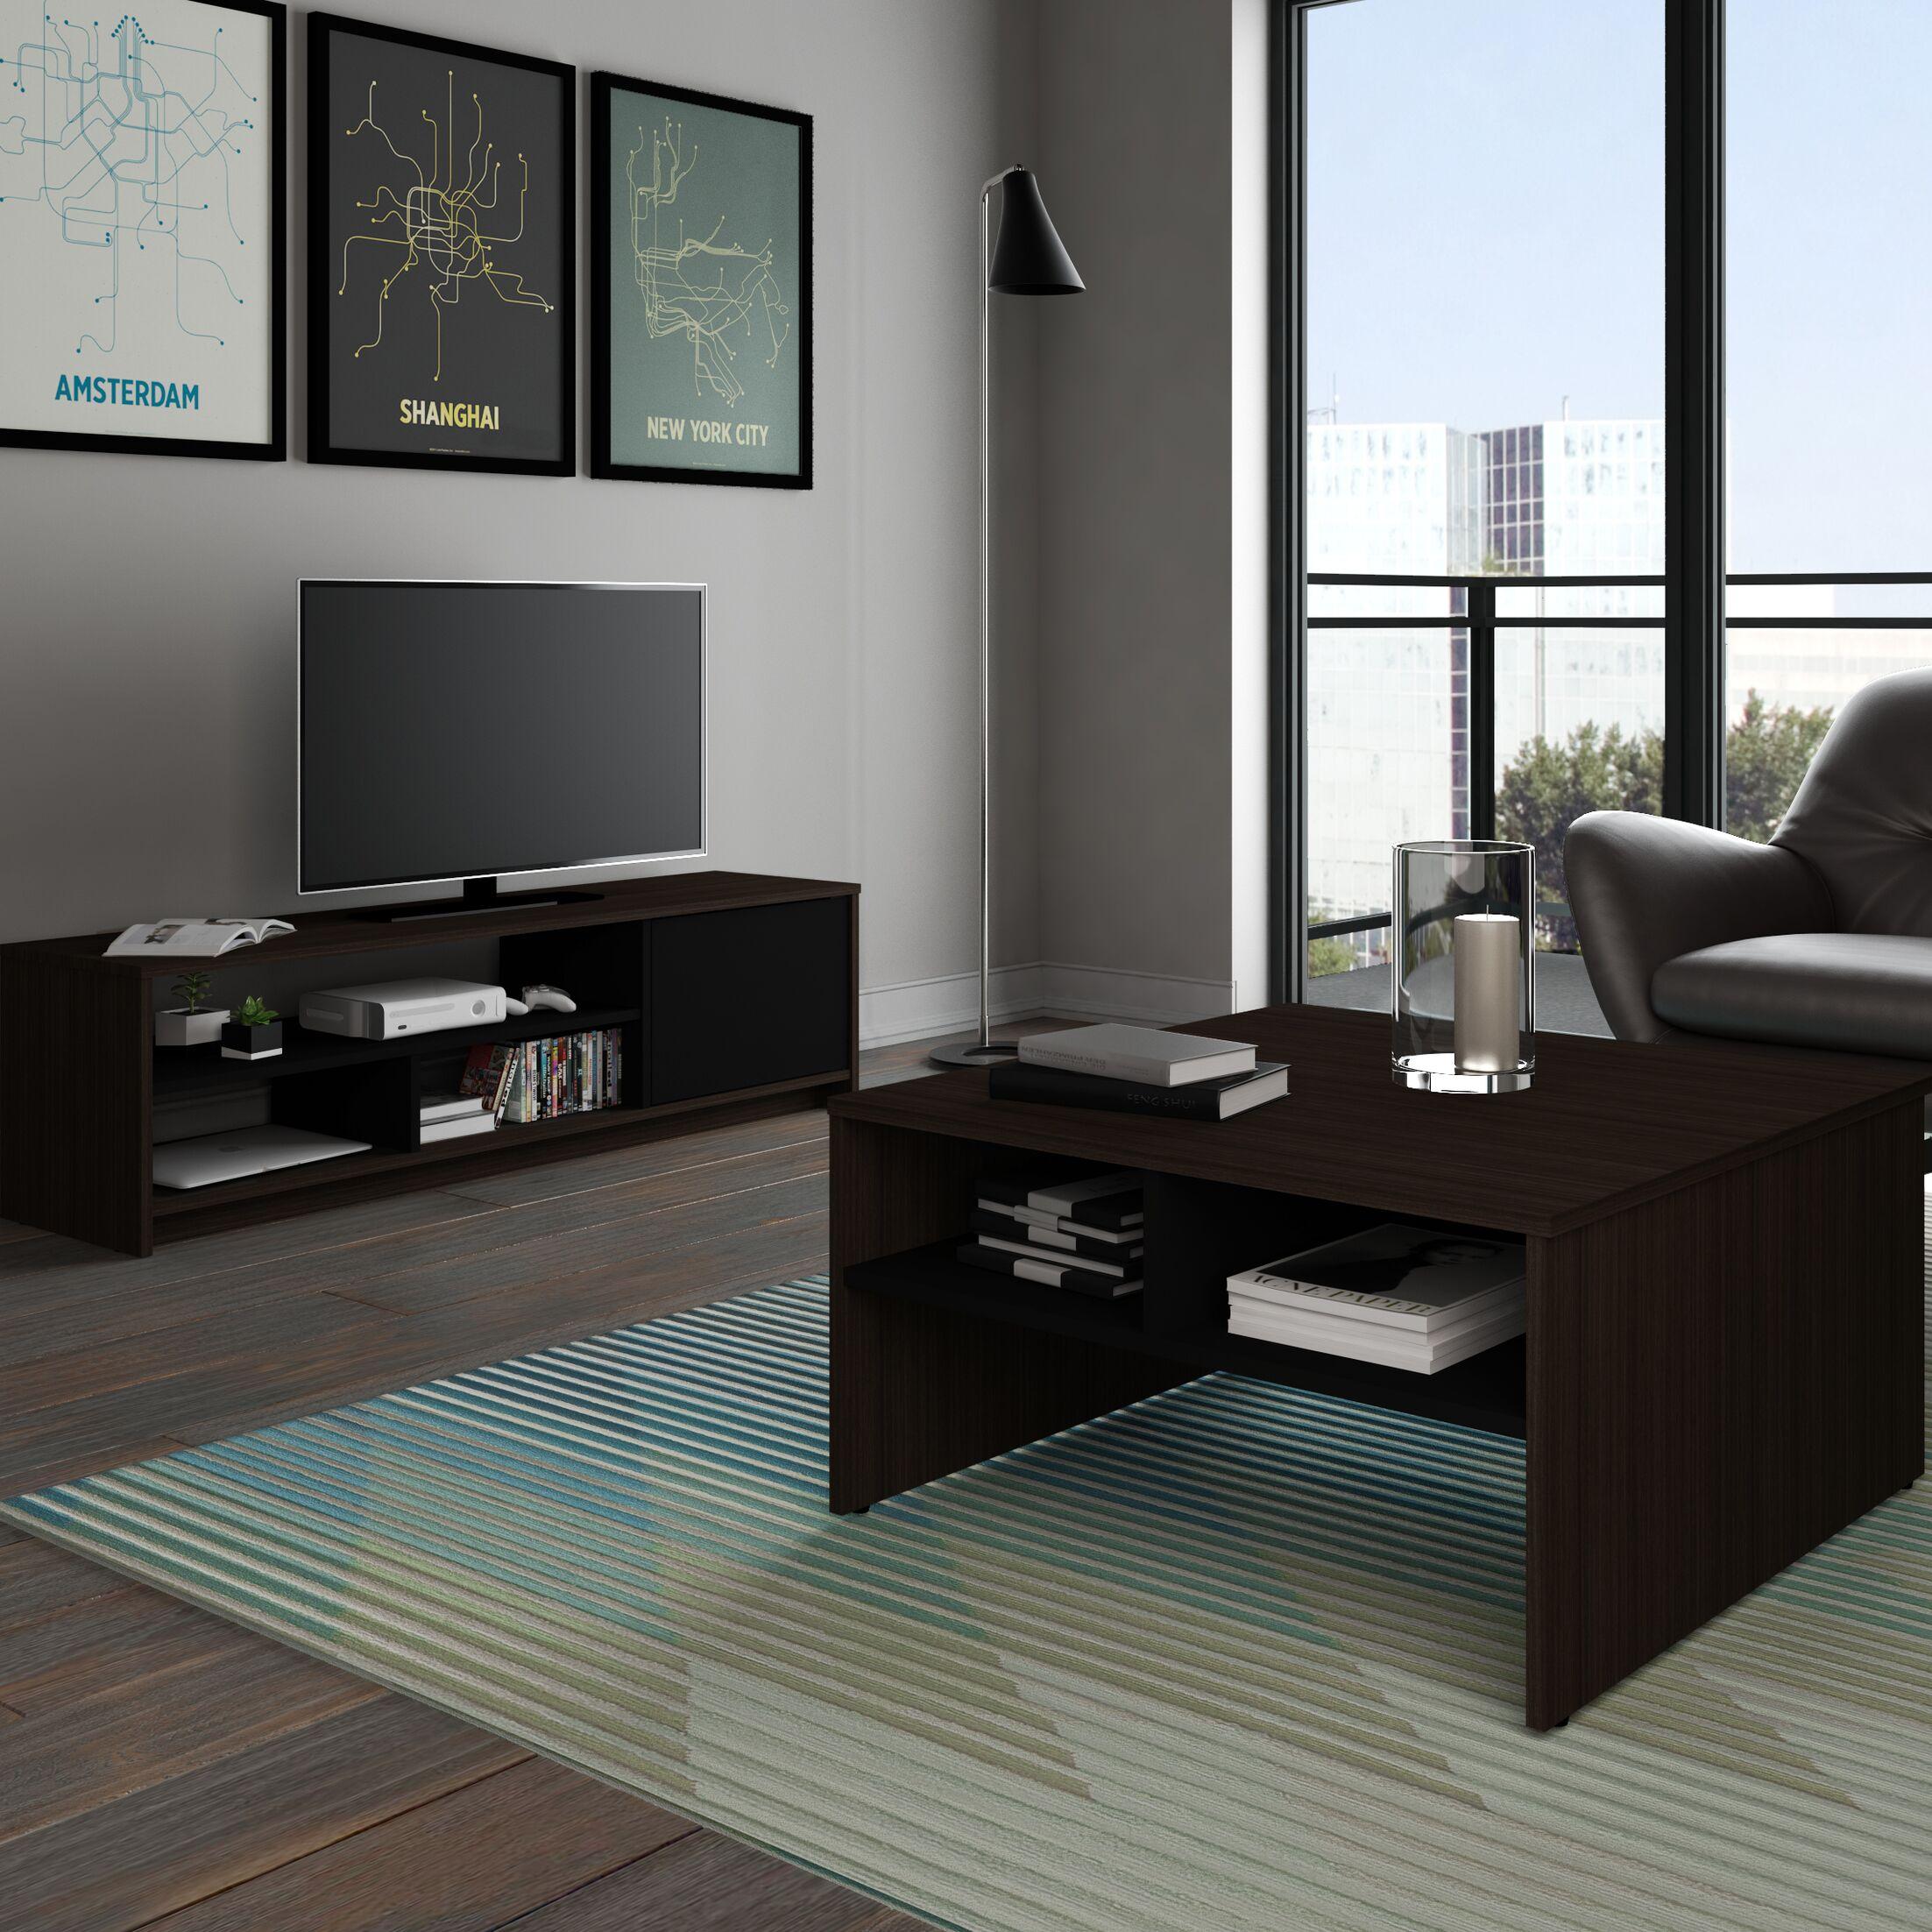 Smit 2-Piece Storage Coffee Table and TV Stand Set Color: Dark Chocolate/Black